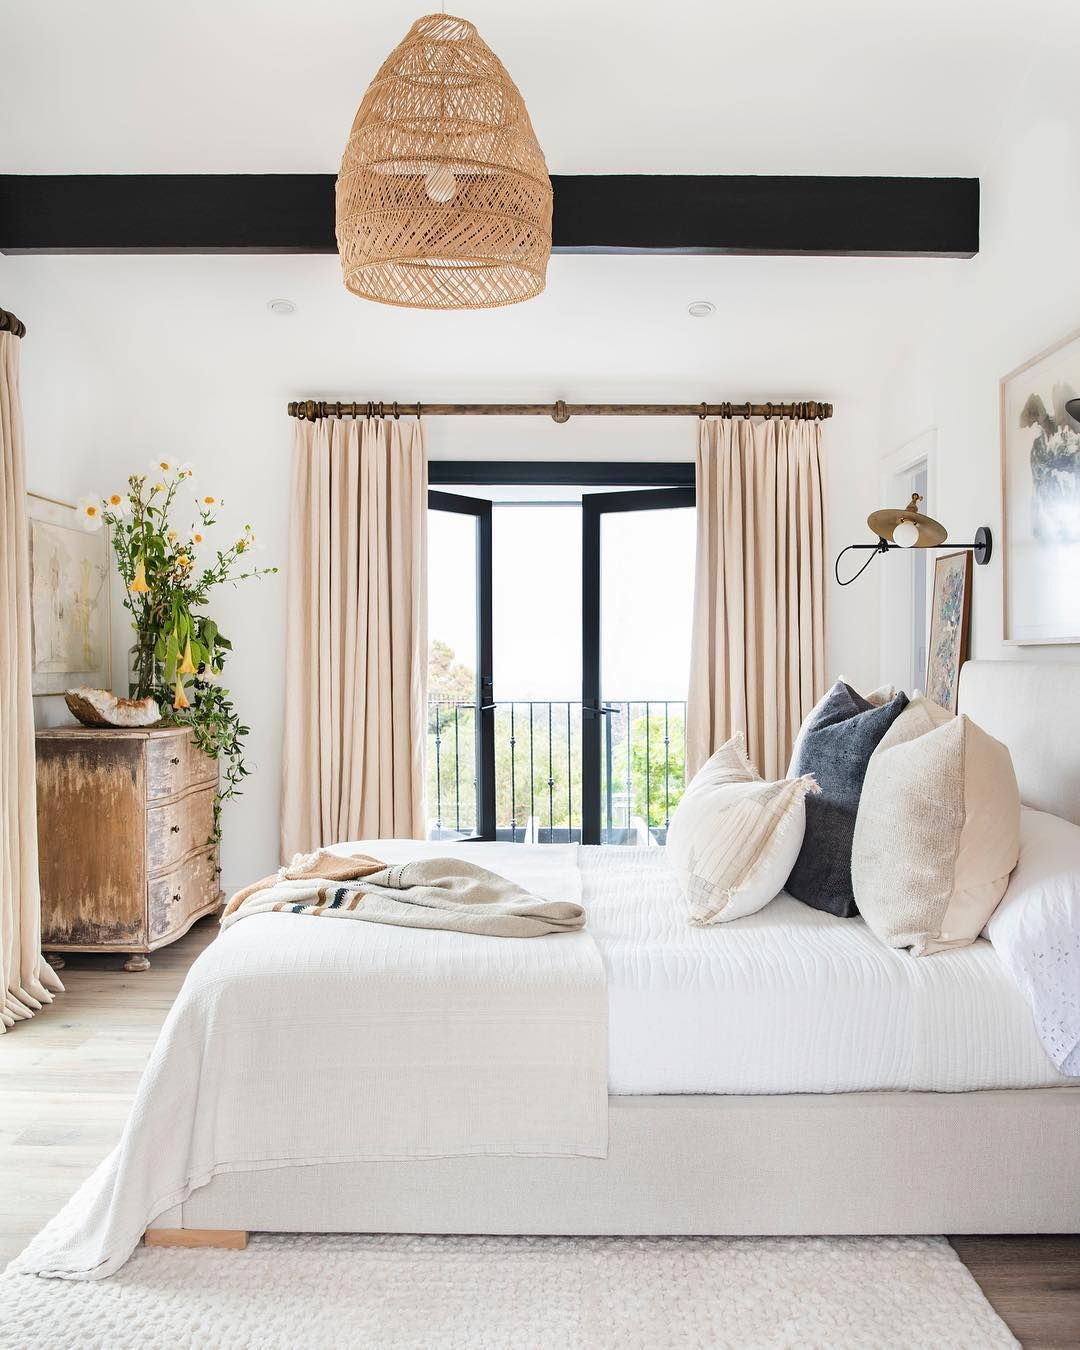 cocoon bedroom design inspiration interior design high quality rh pinterest com